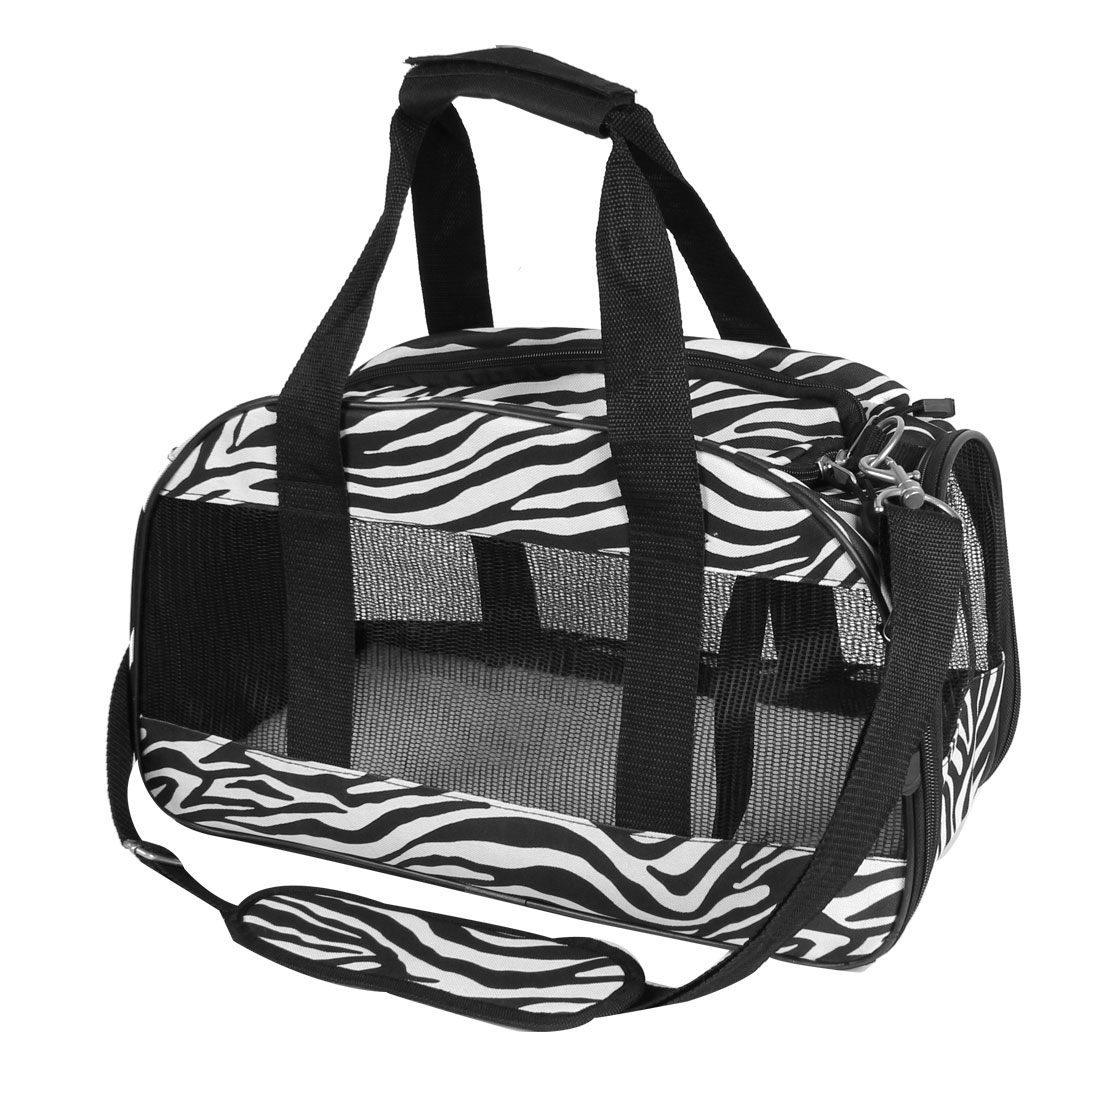 Zebra Print Netty Travel Carrier Carry Zipped Puppy Pet Bag Black White